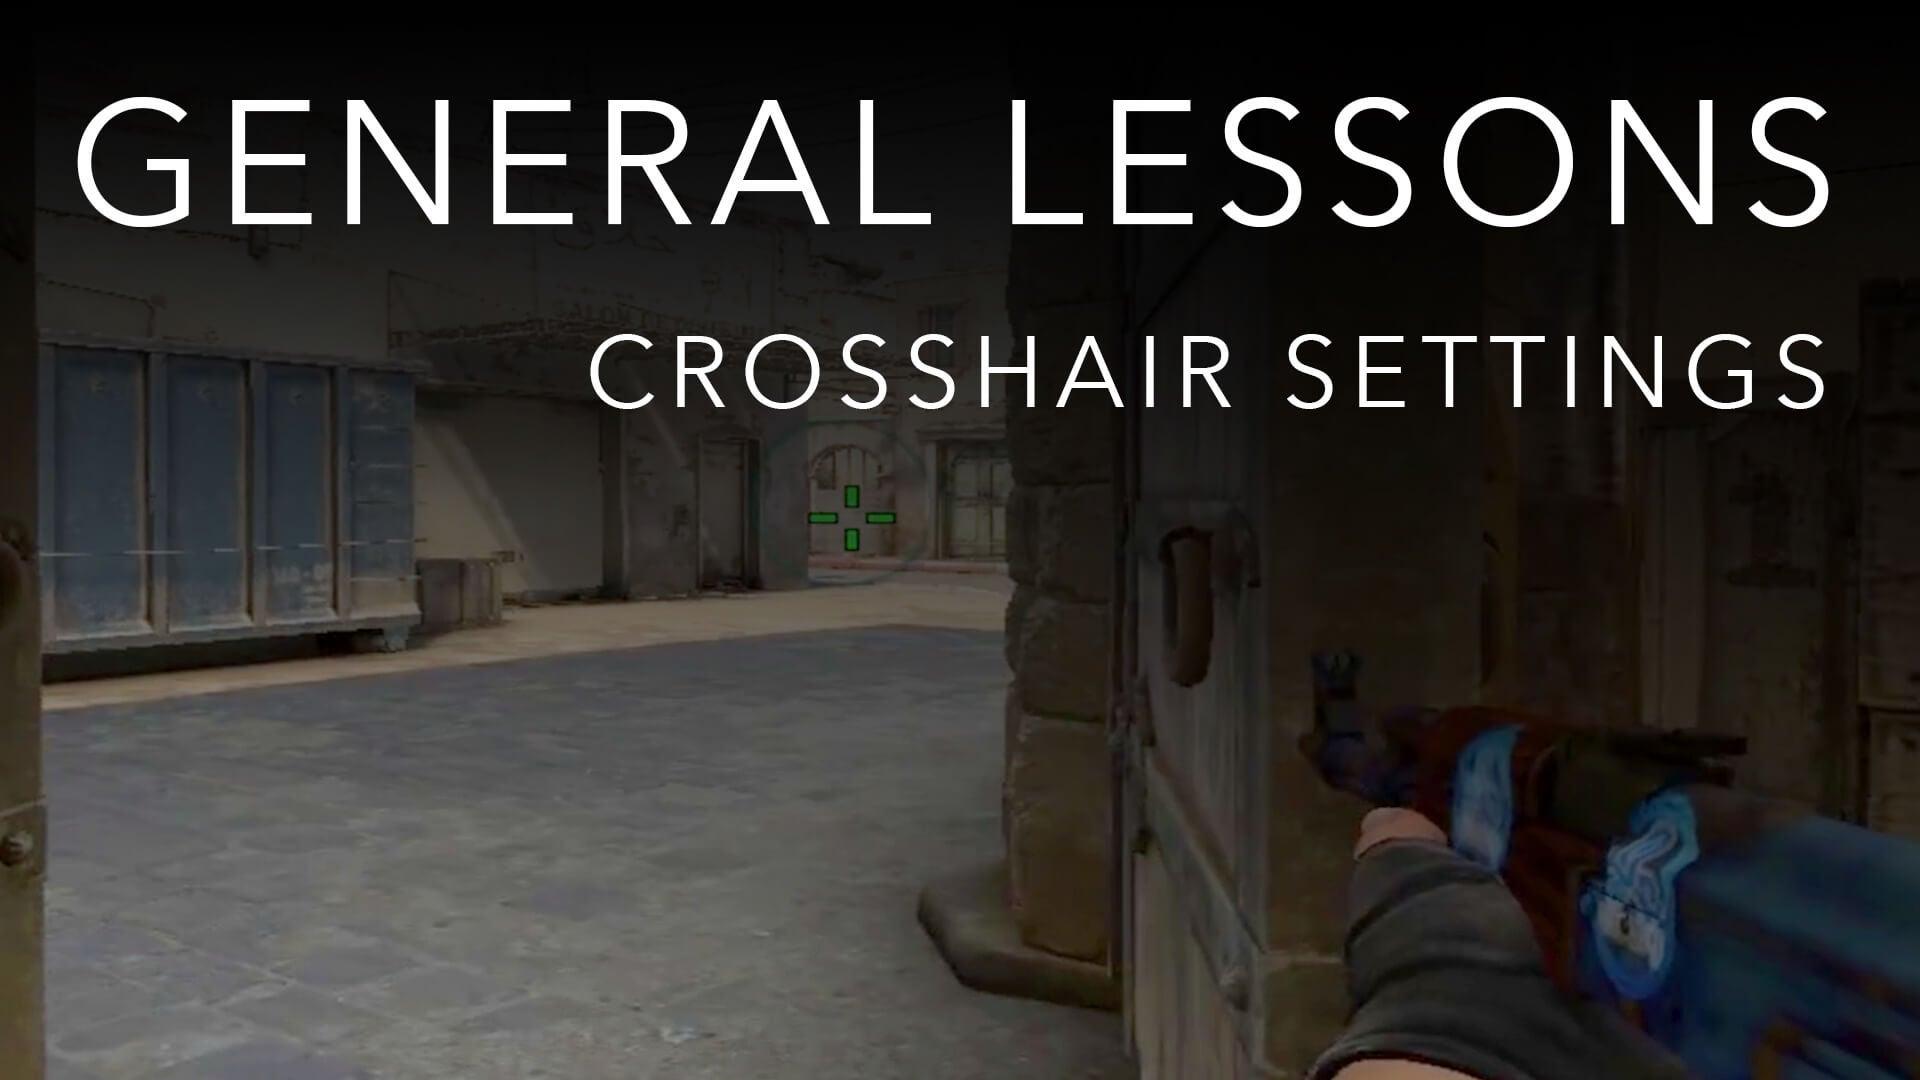 Crosshair Settings